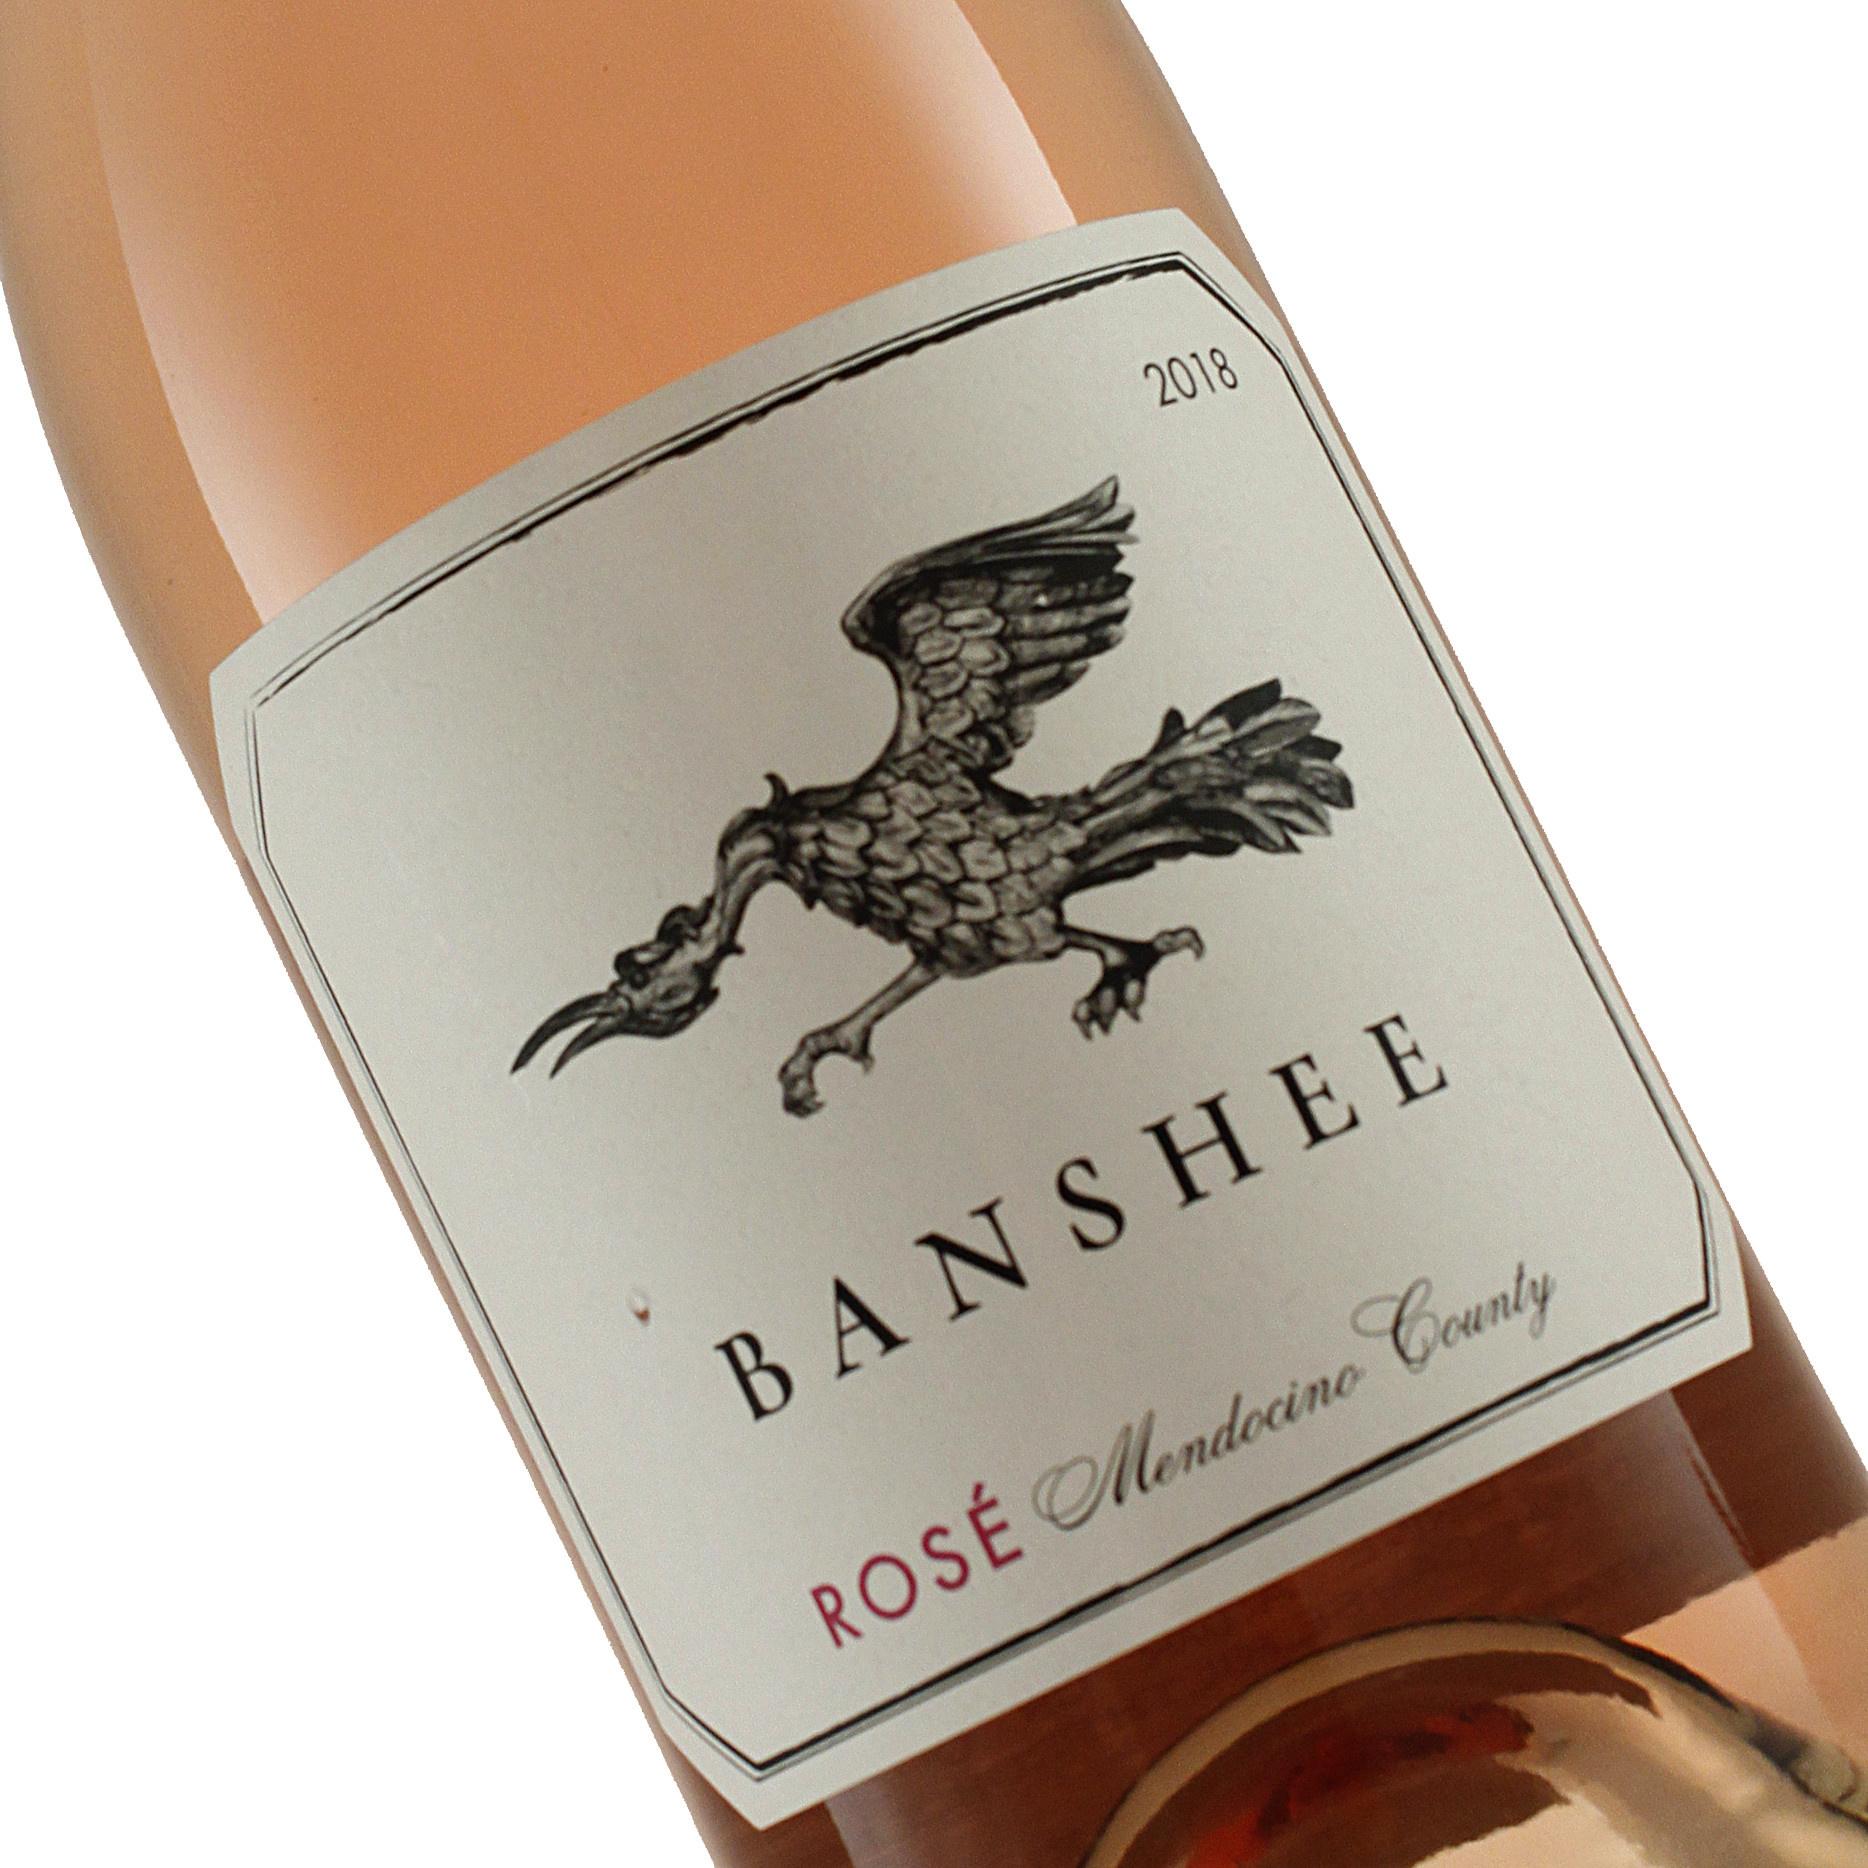 Banshee 2018 Rose, Mendocino County